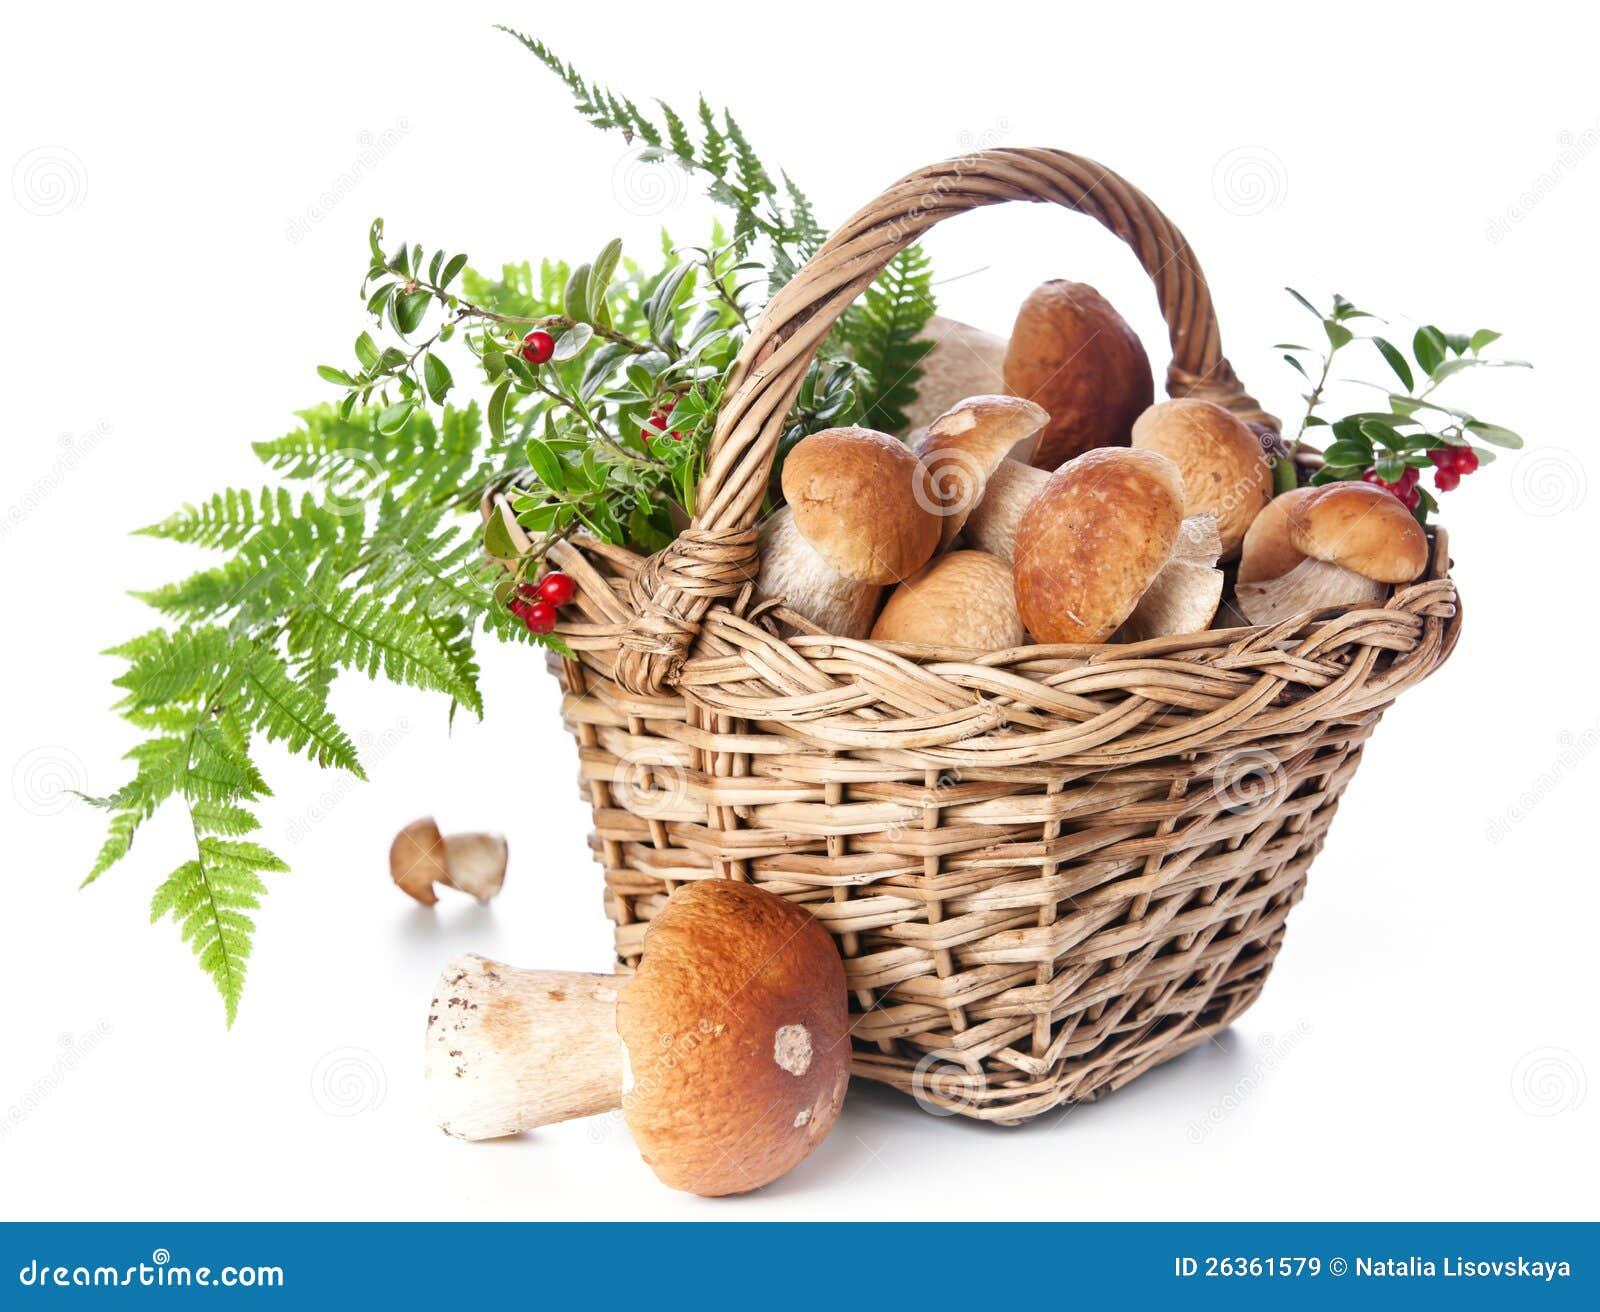 Boletus mushrooms in wicker basket